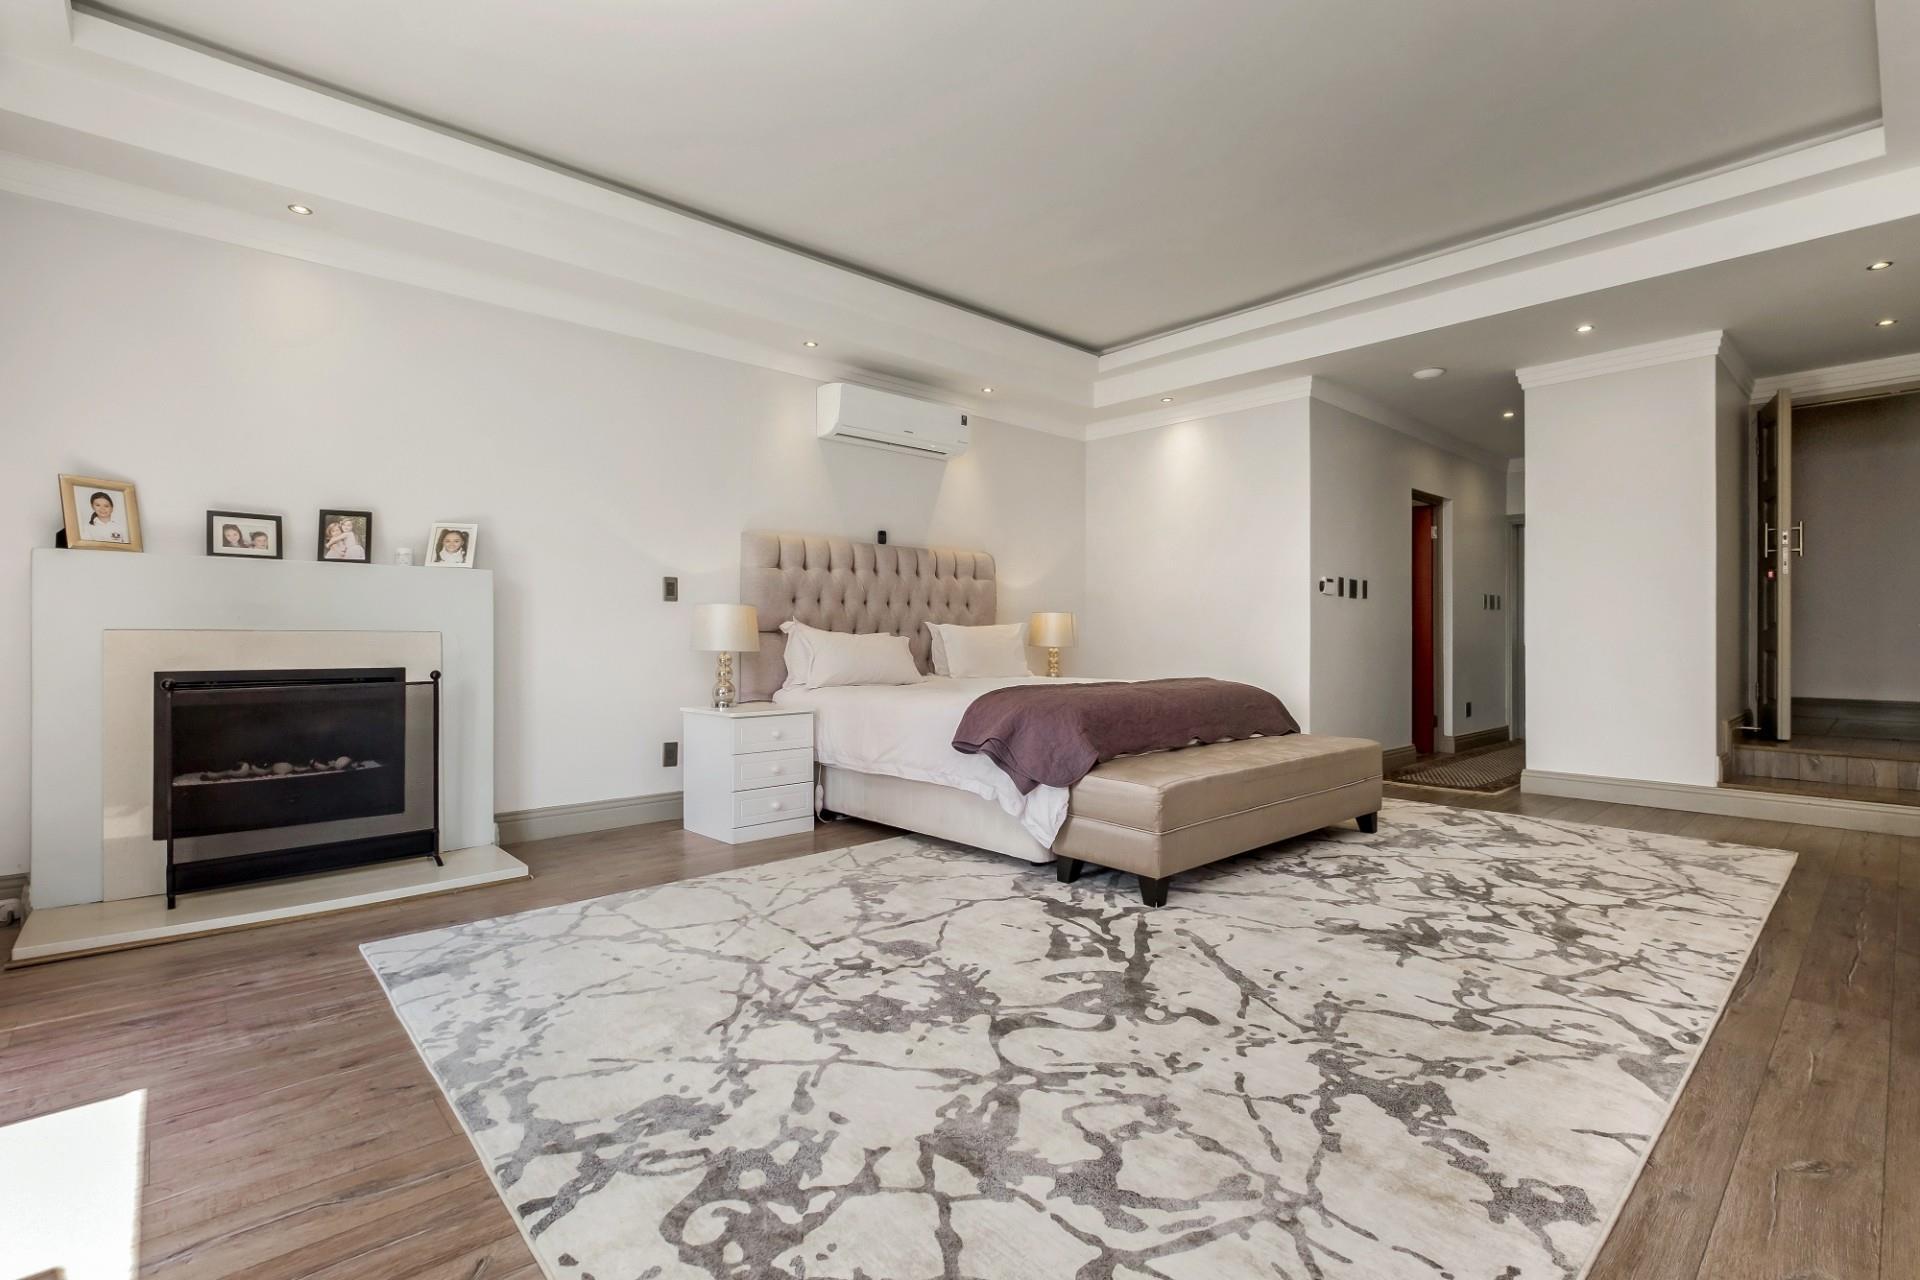 4 Bedroom House For Sale in Morningside